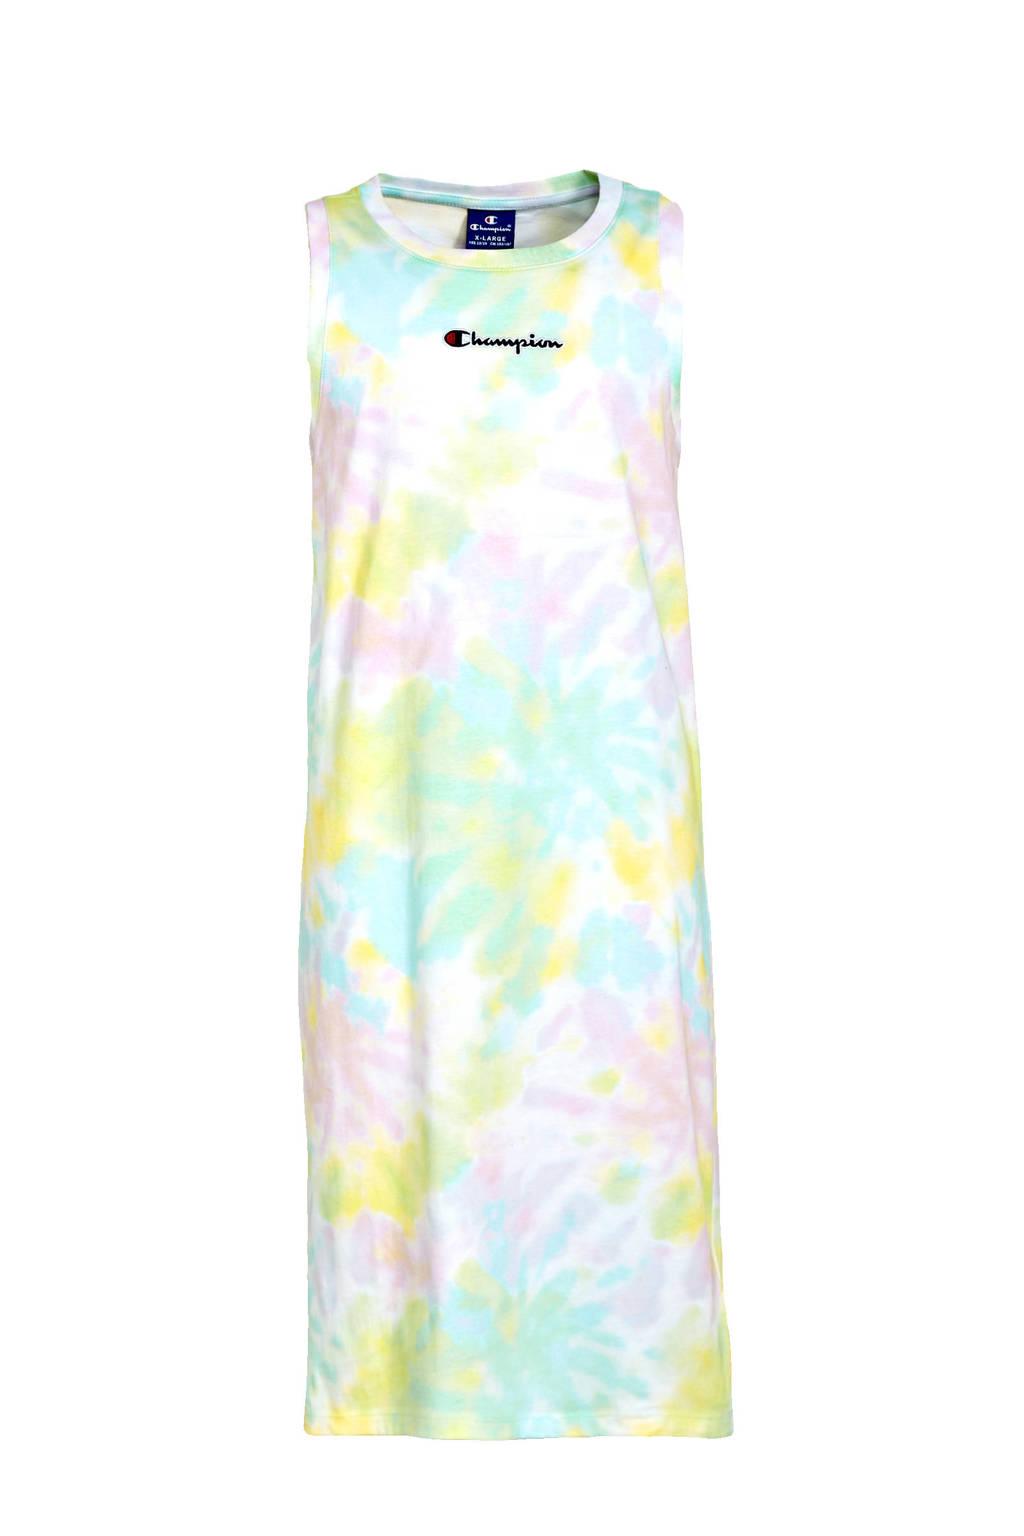 Champion tie-dye maxi jurk mintgroen/multicolor, Mintgroen/multicolor